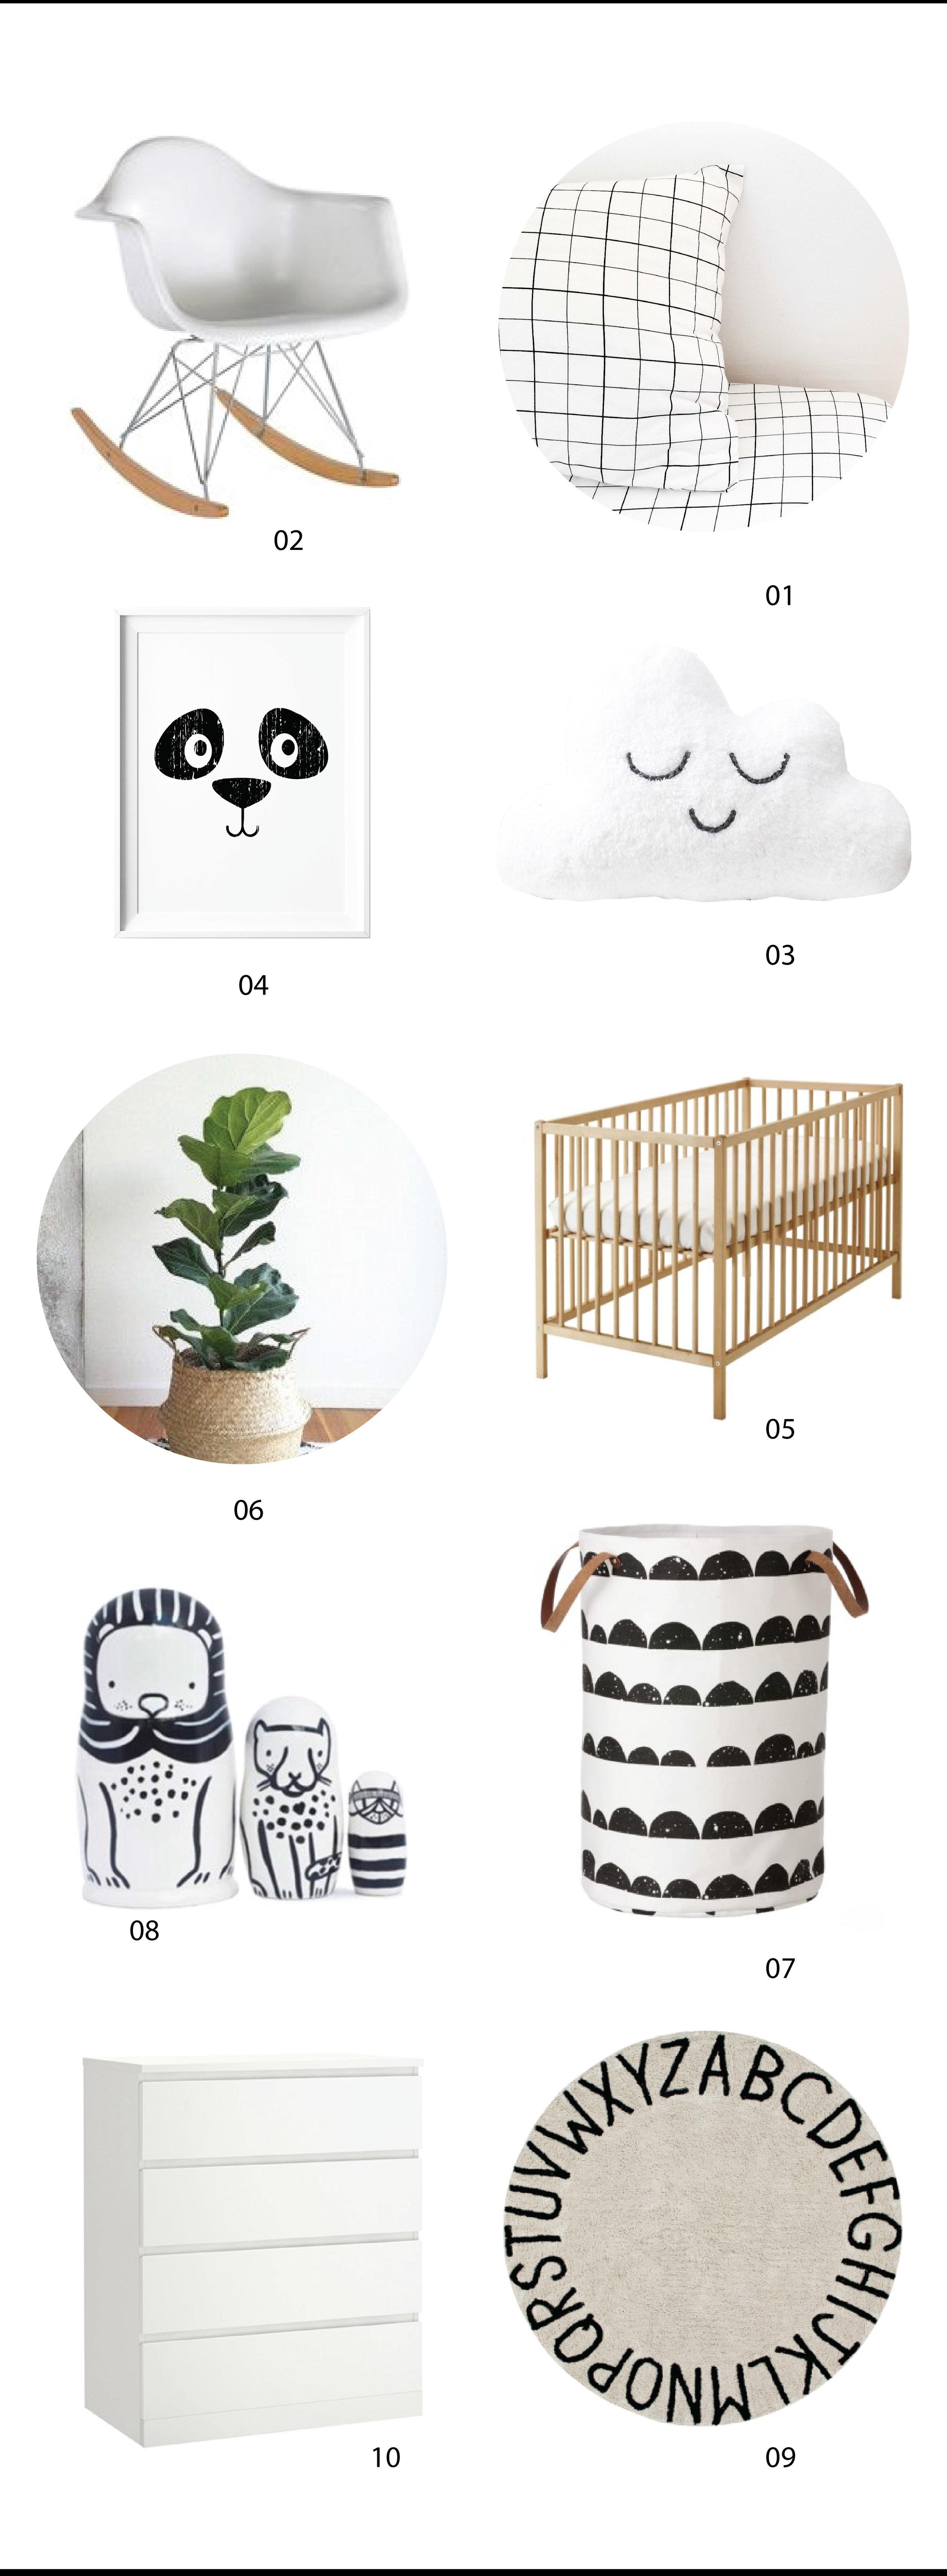 minimalist nursery essentials by Katya Malkin 3-02.jpg